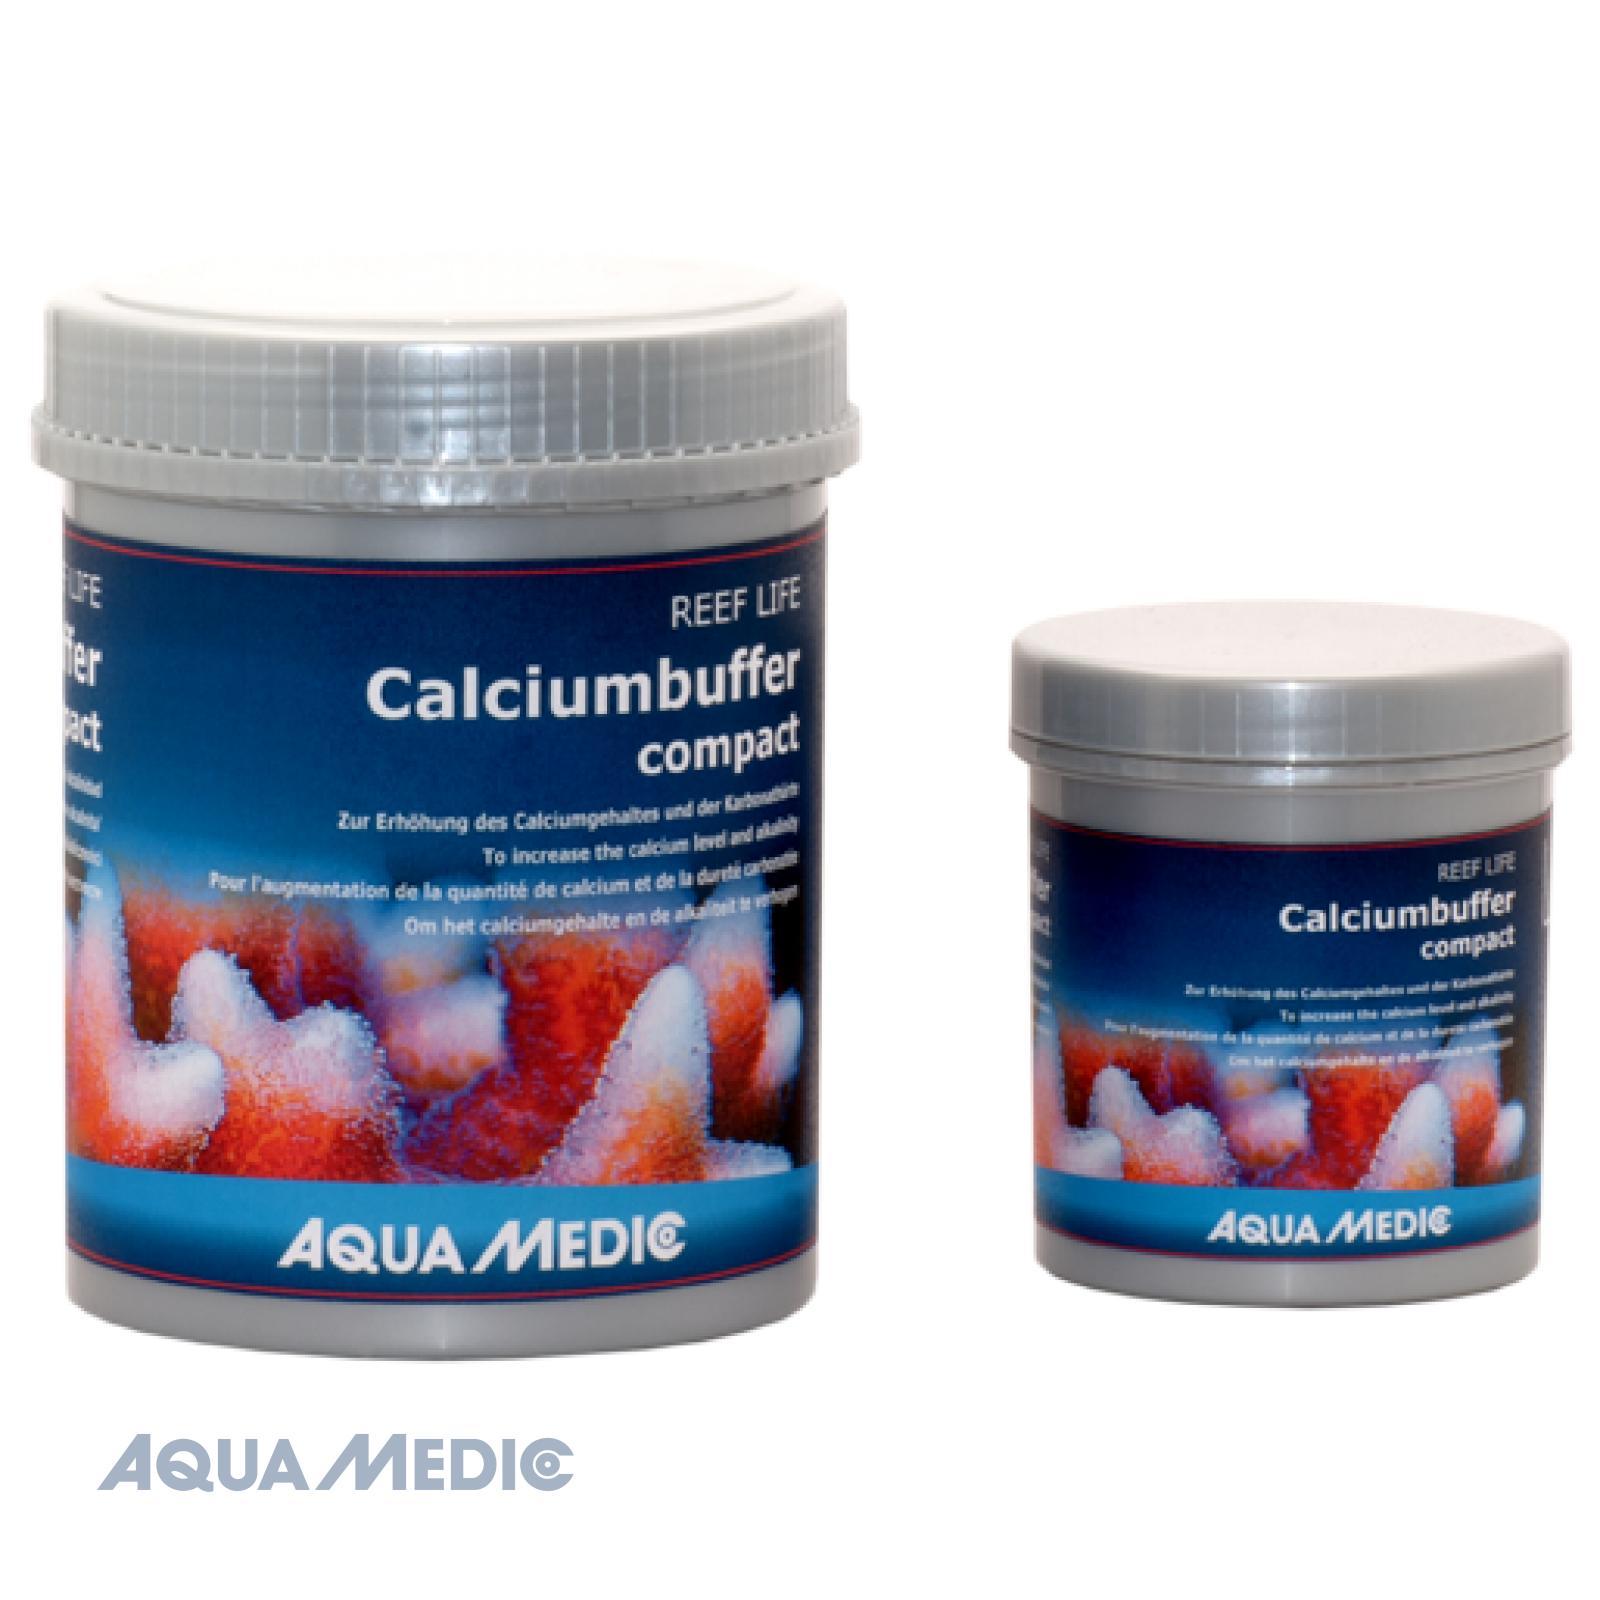 Aquamedic Compact Calcium Buffer 250g